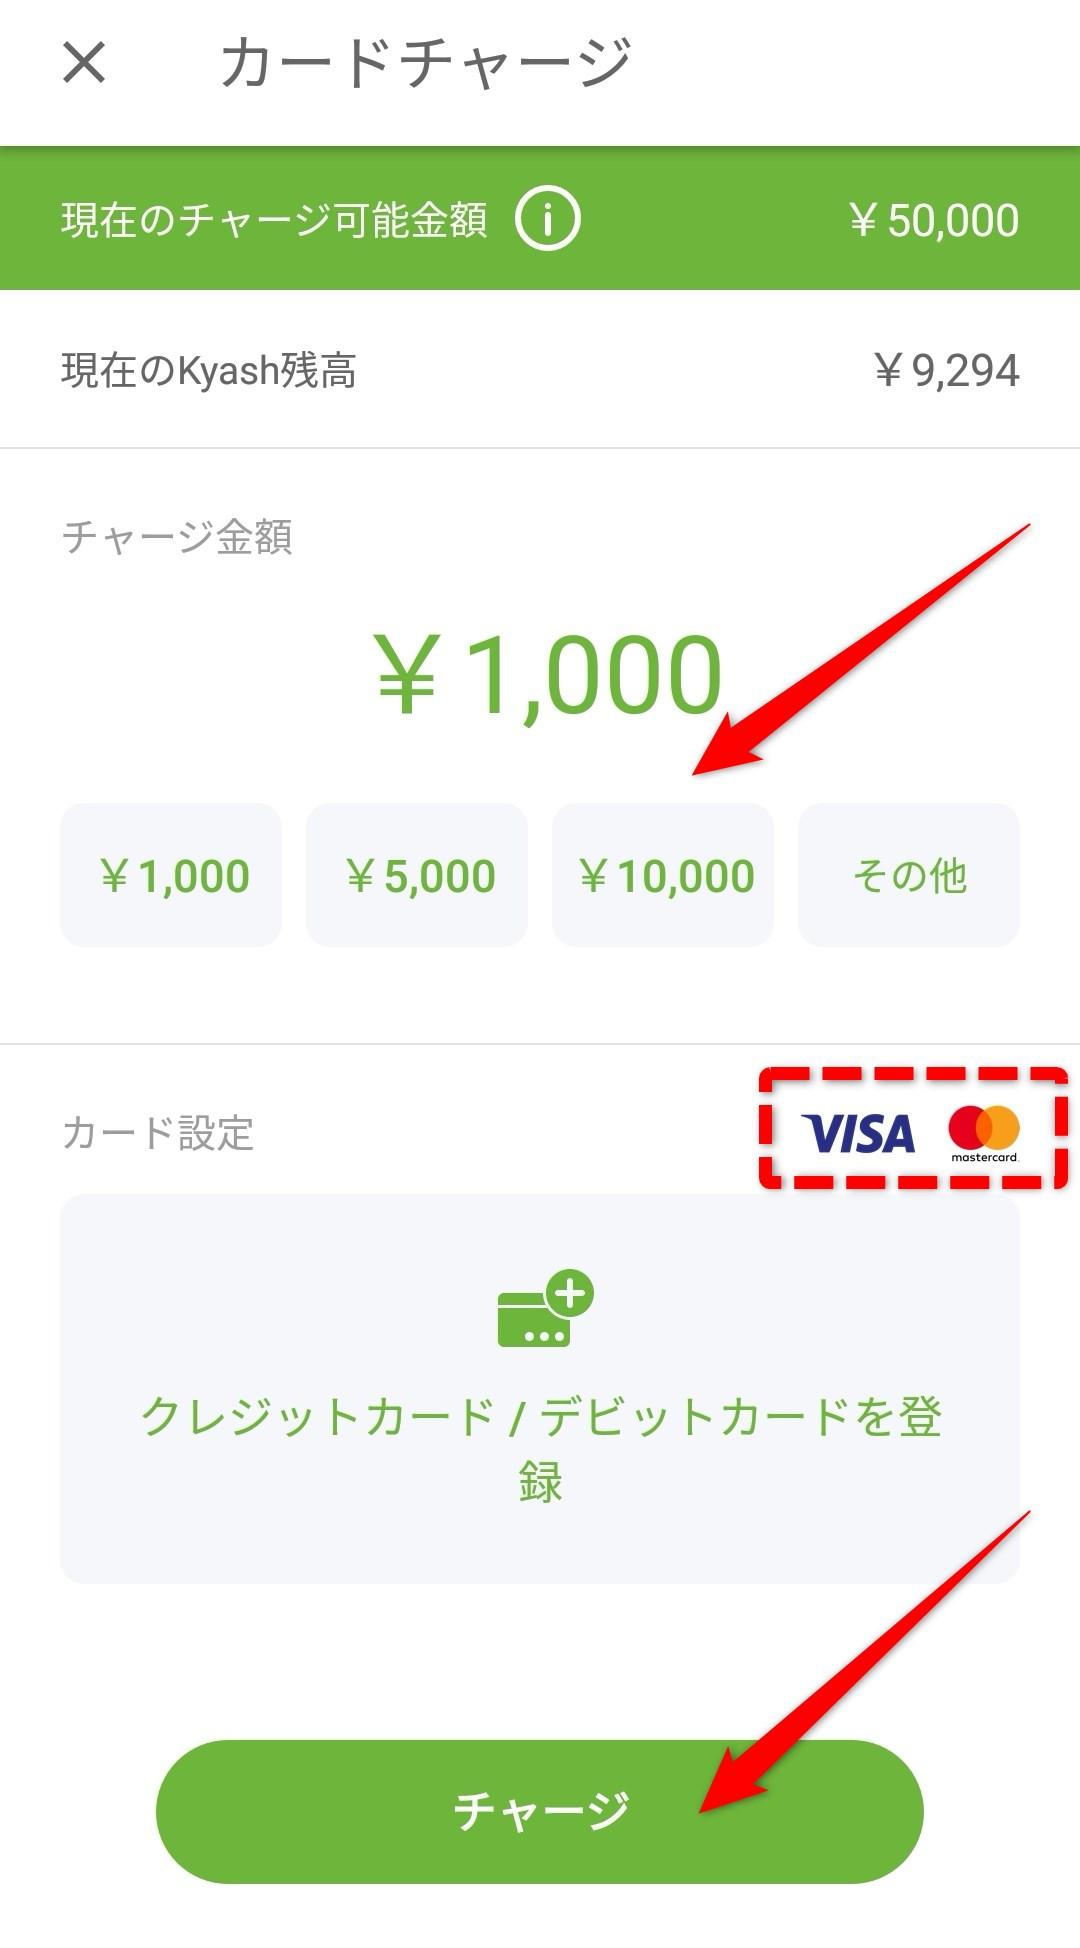 Kyash-クレジットカードチャージ:手順2